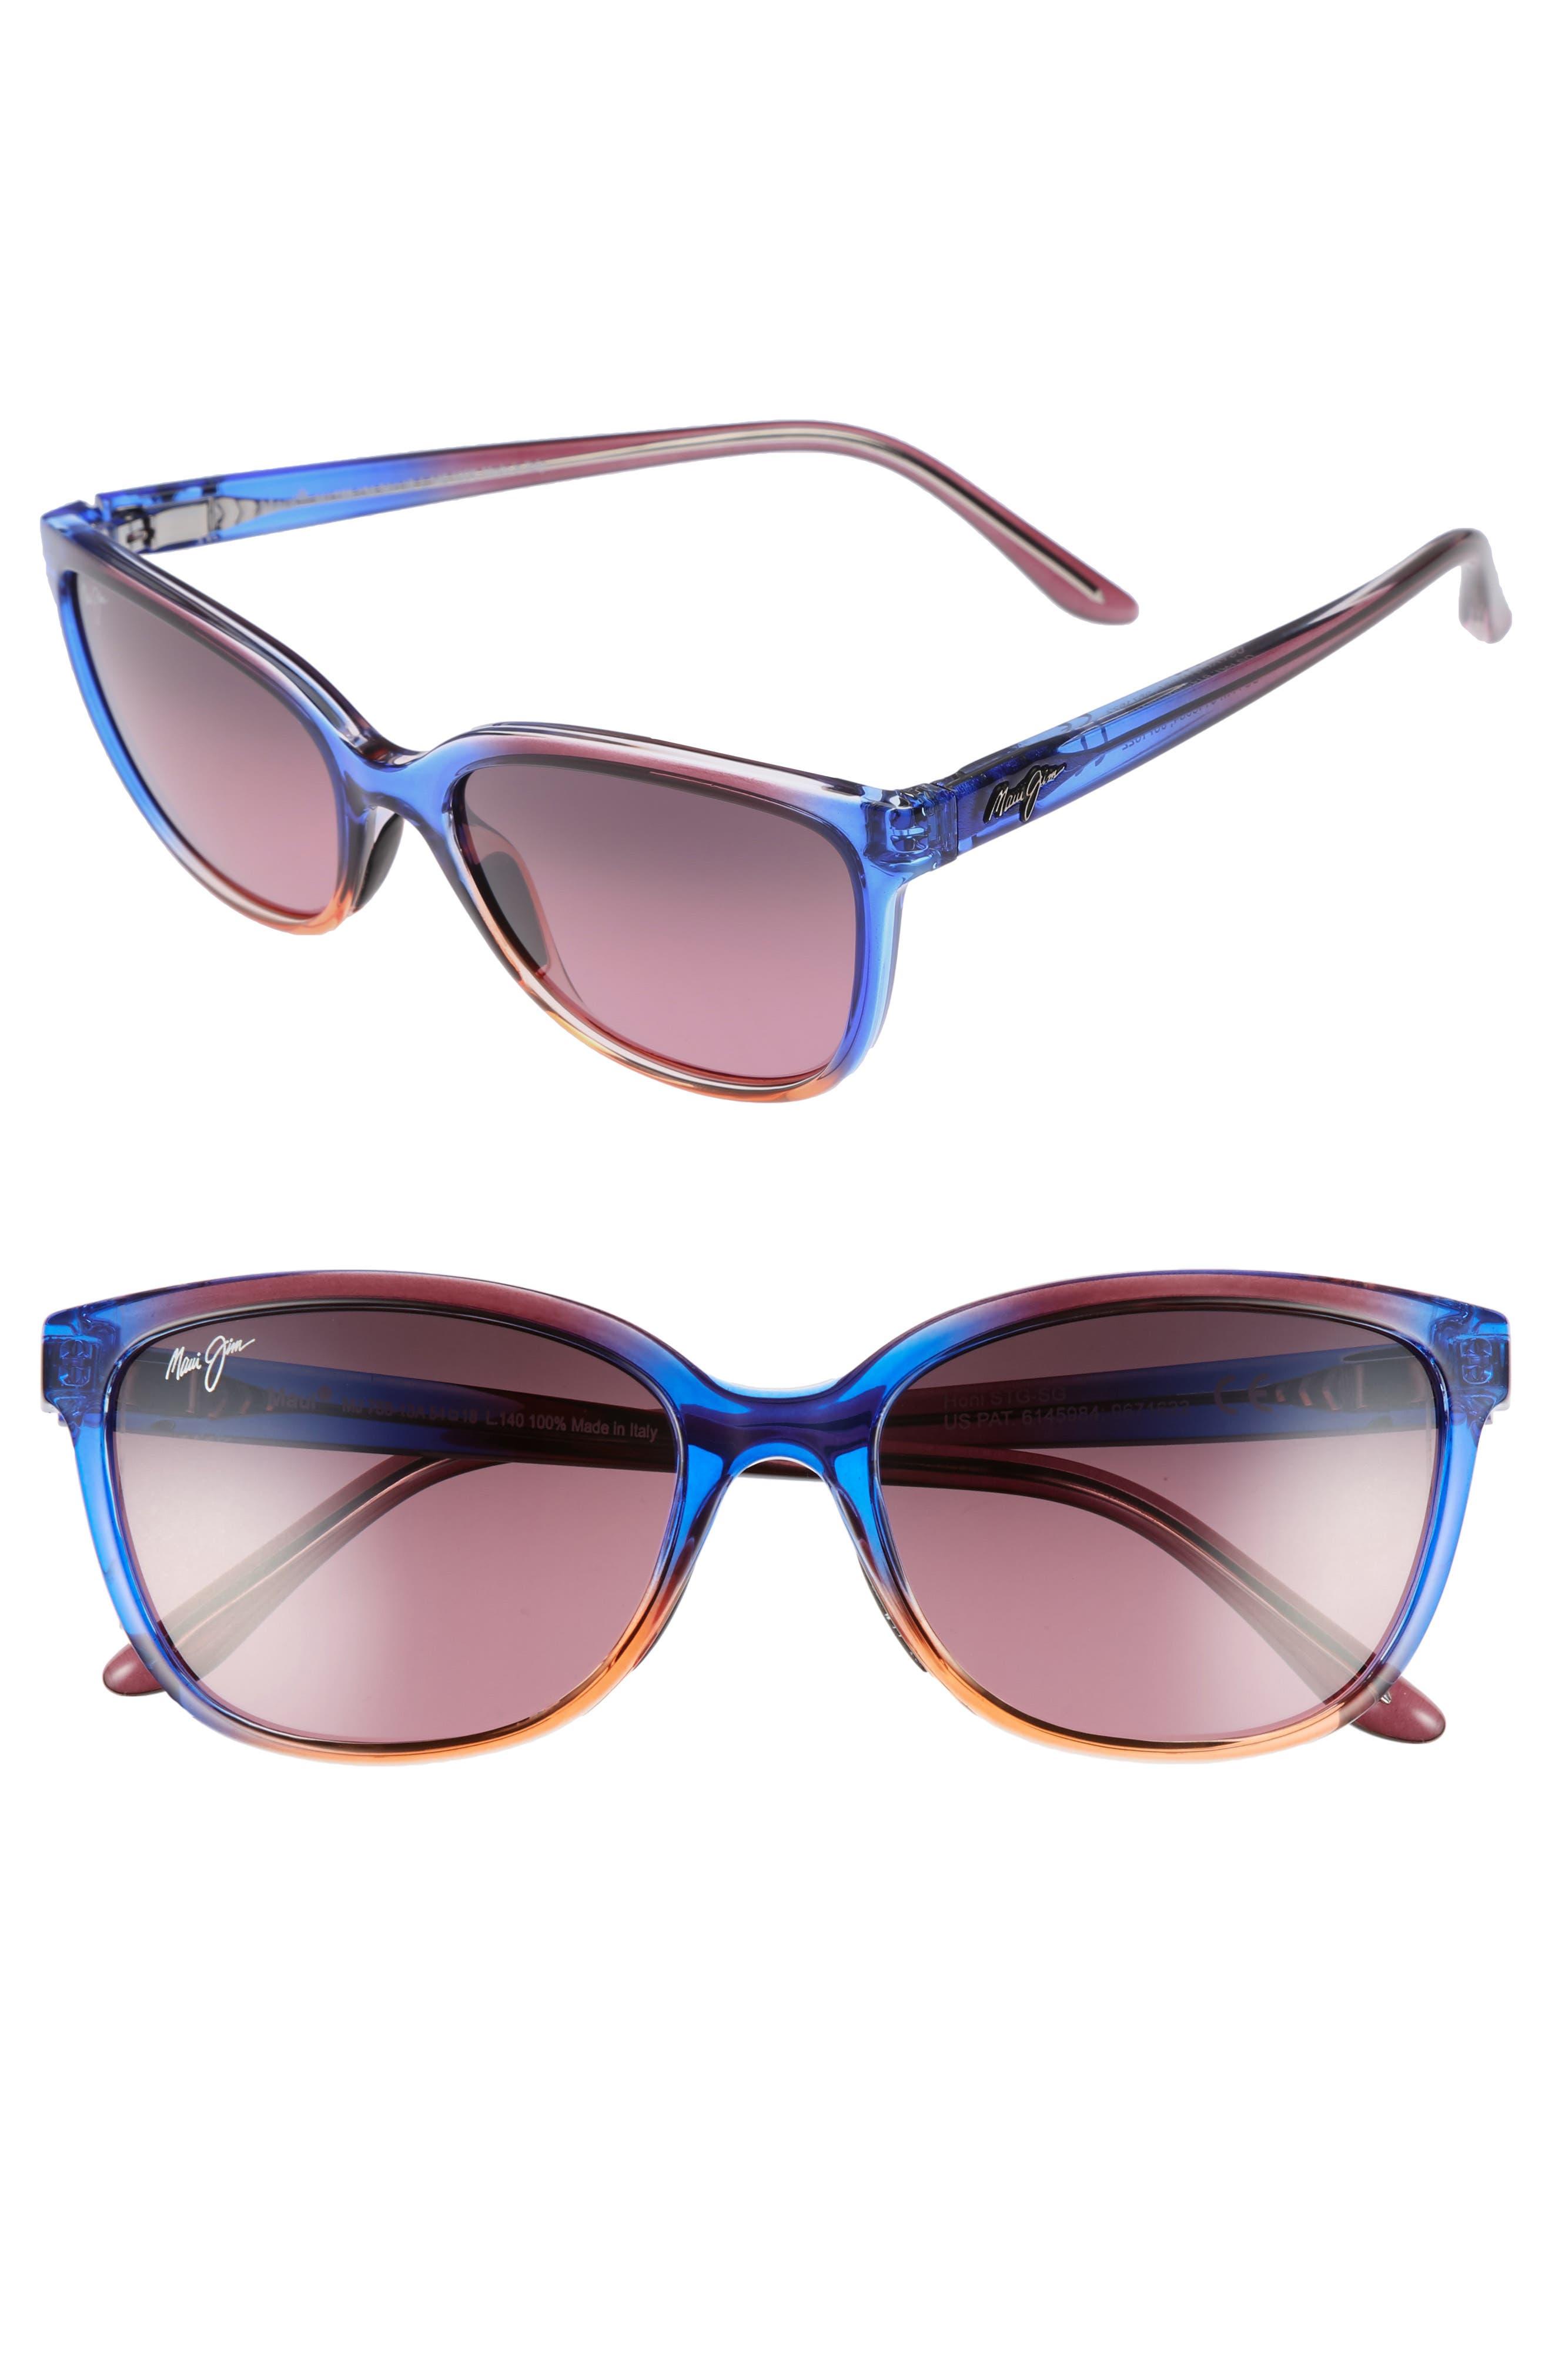 a5a4e17876ca Pink Sunglasses for Women